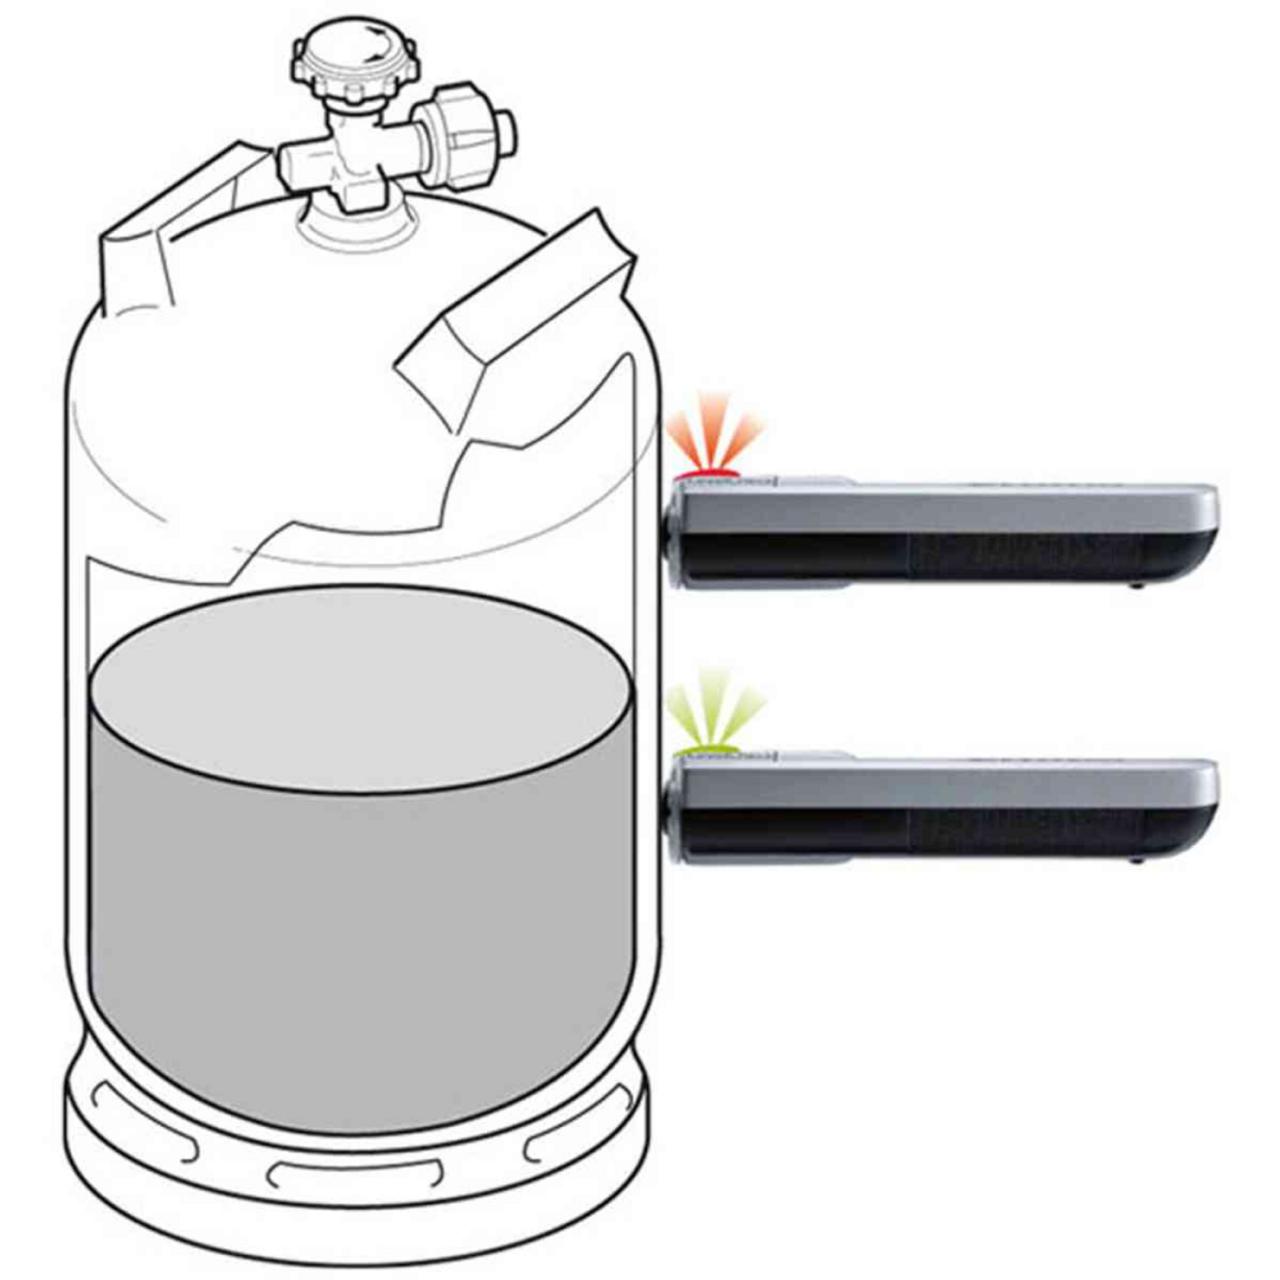 Truma LPG gas level monitor checks gas levels with LED display and ultrasonic tone.